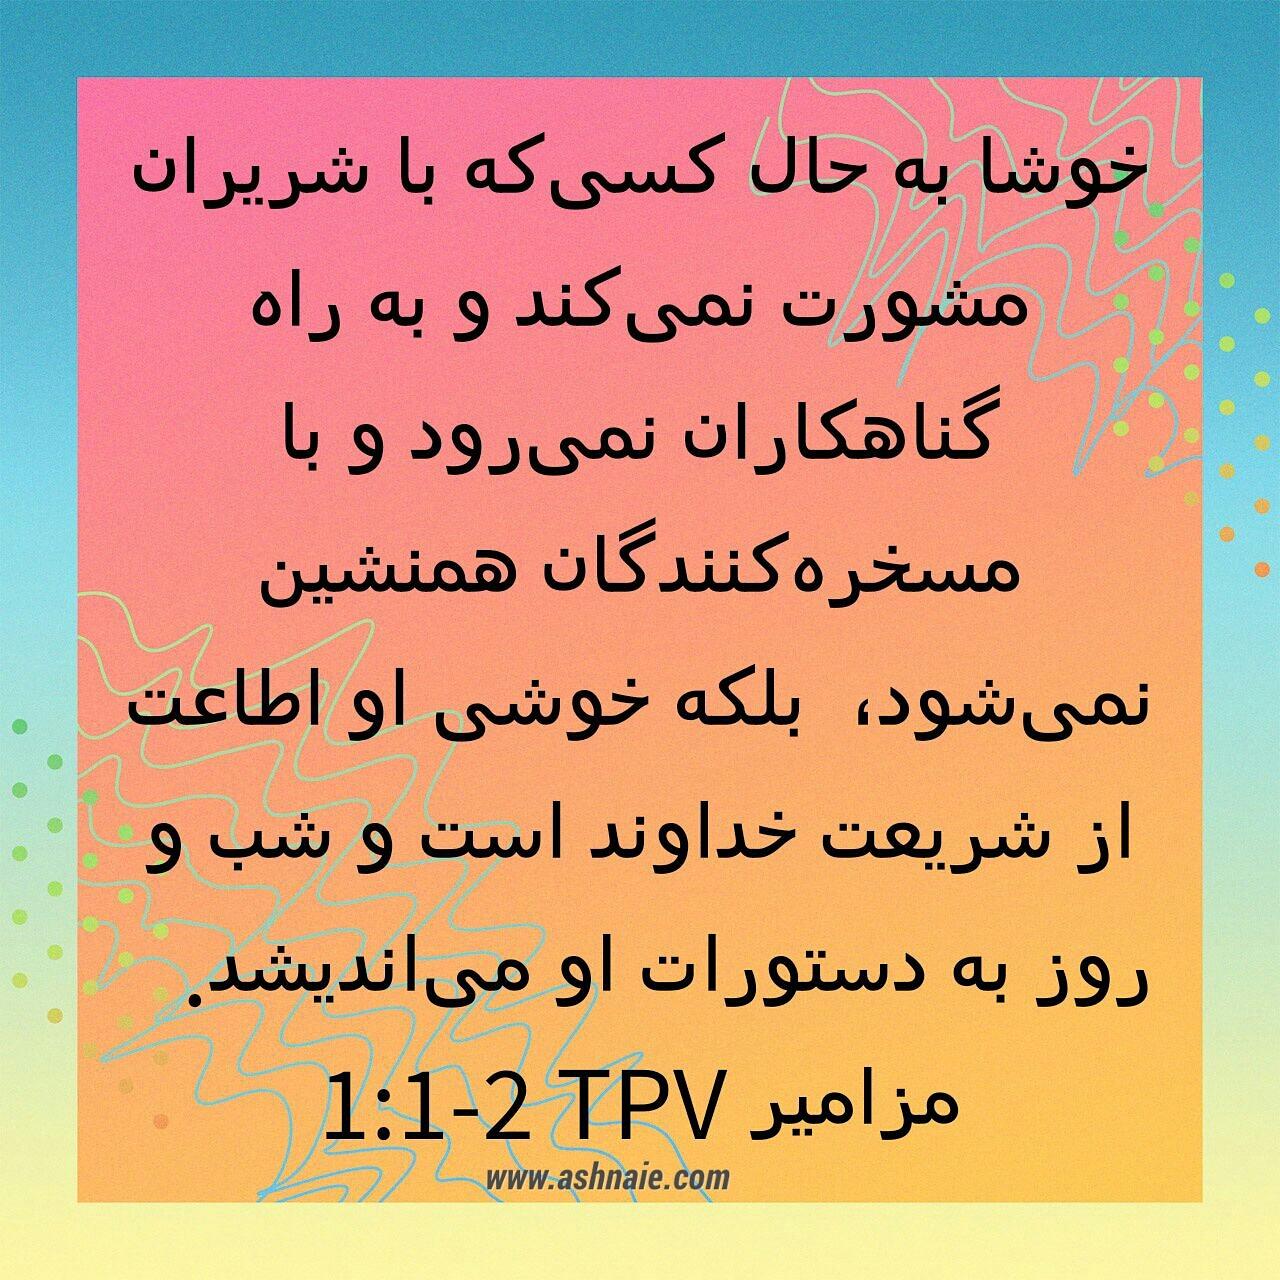 IMG_20180718_232414_678.jpg